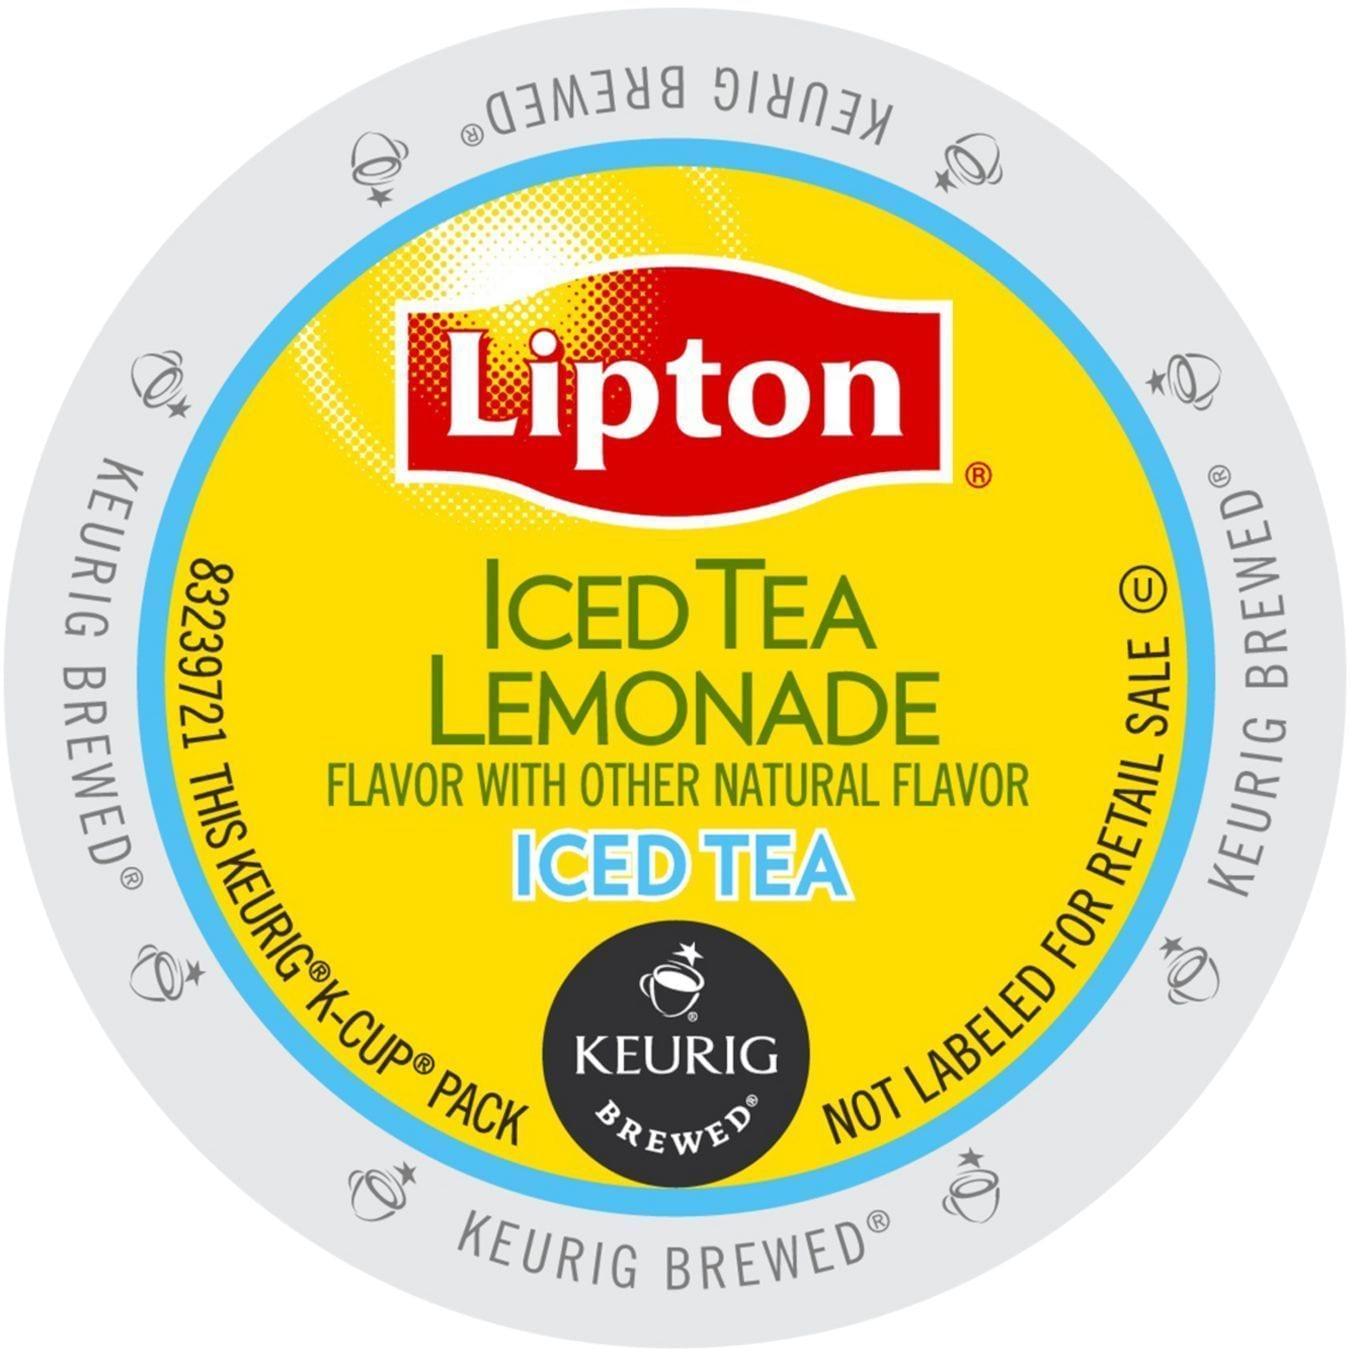 Lipton Iced Tea Lemonade K-Cup Portion Pack for Keurig Br...